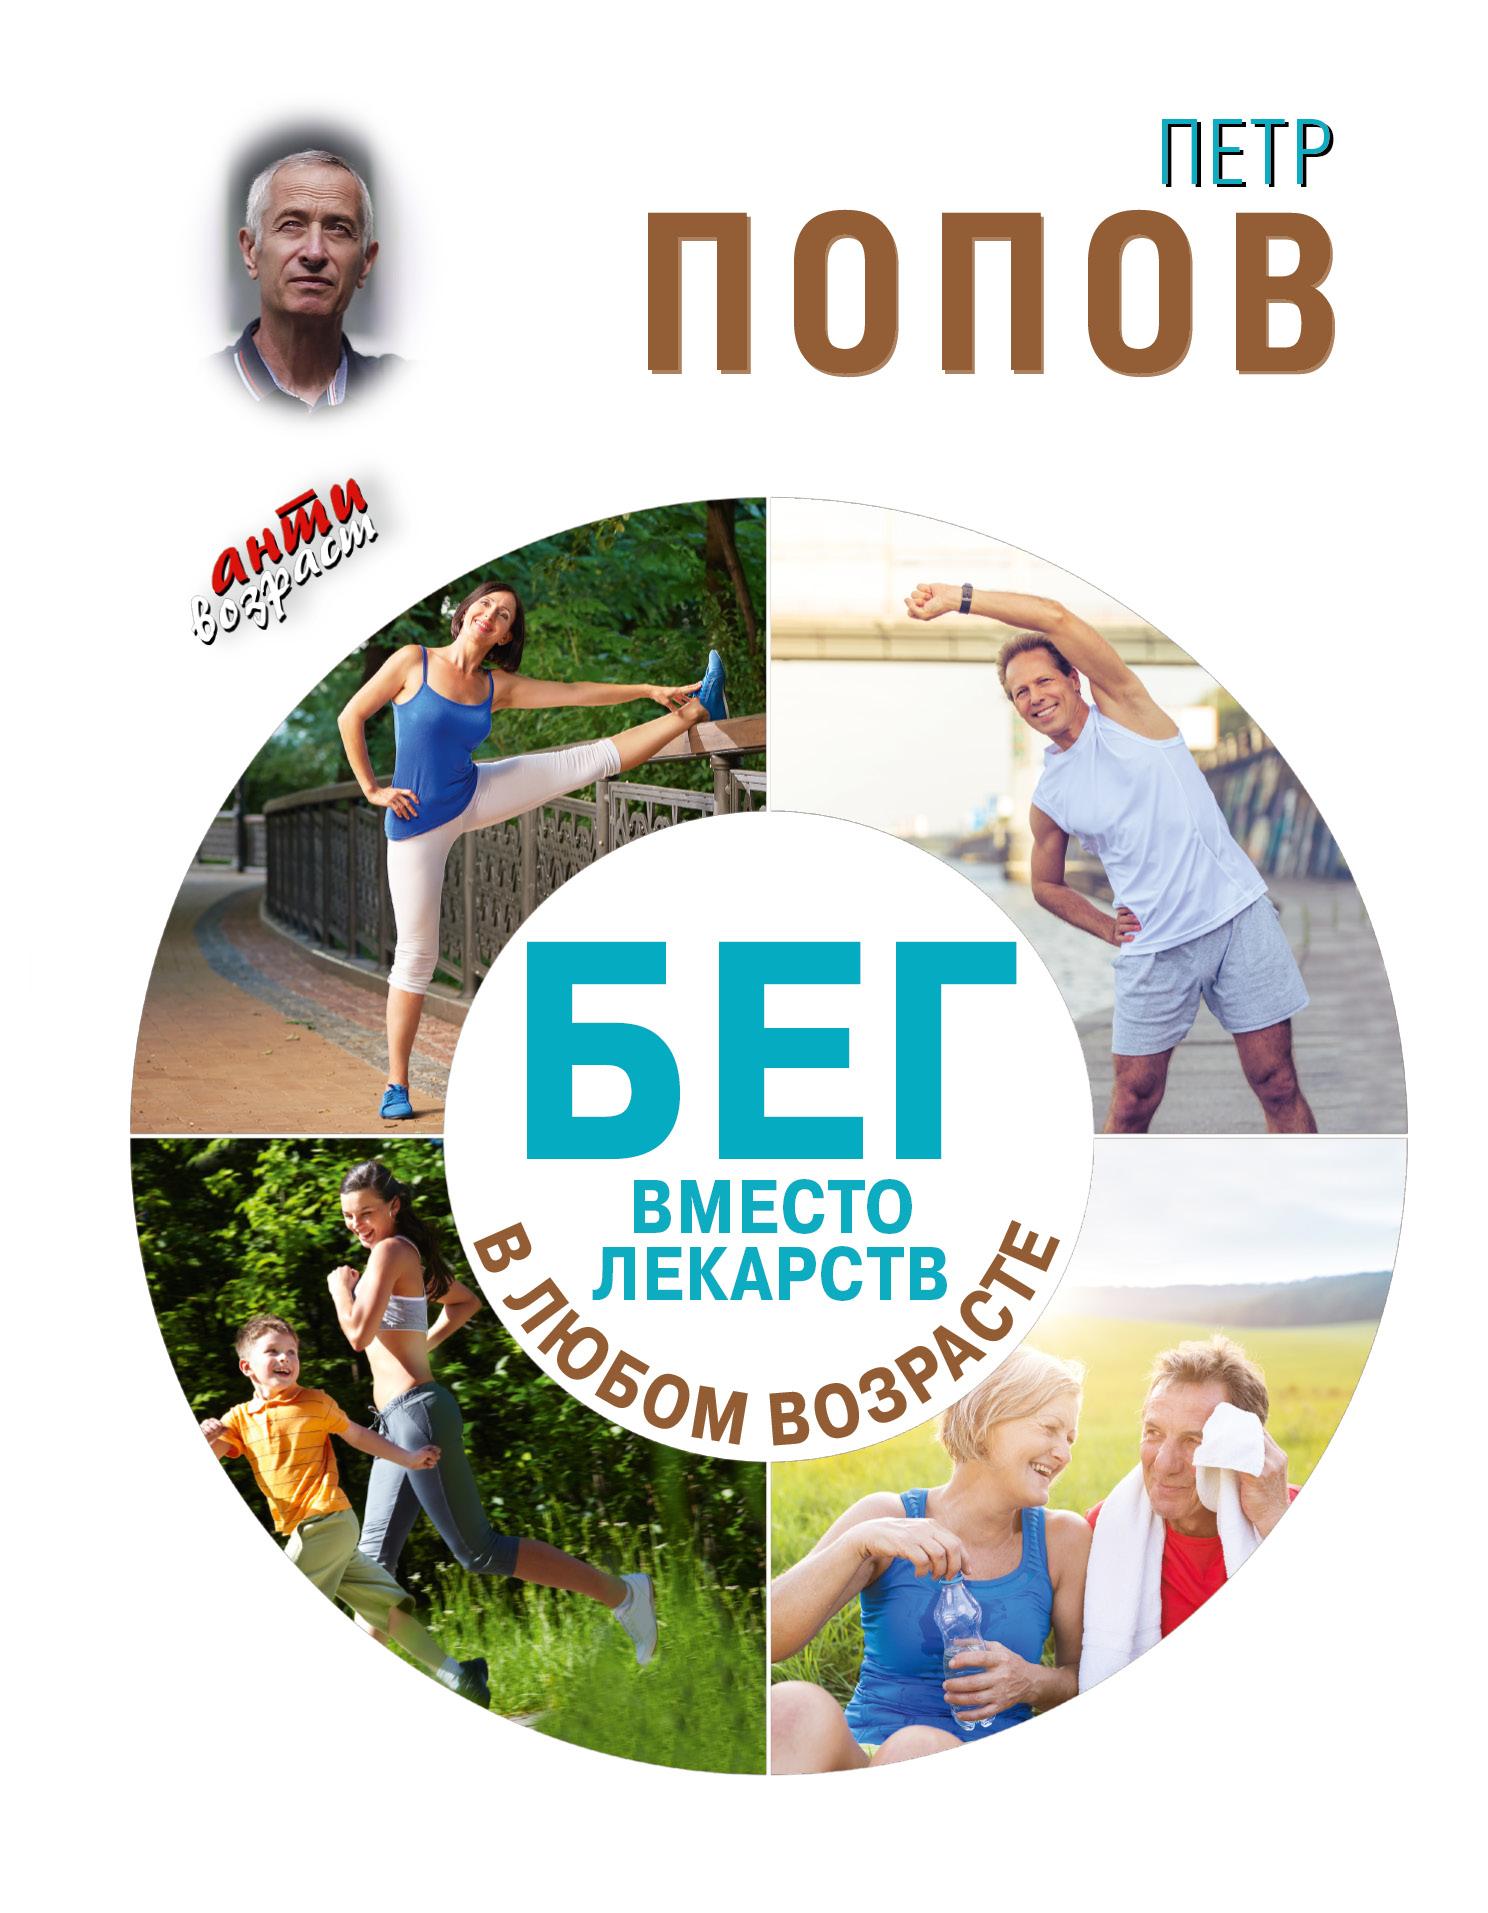 Попов П.А. Бег вместо лекарств в любом возрасте